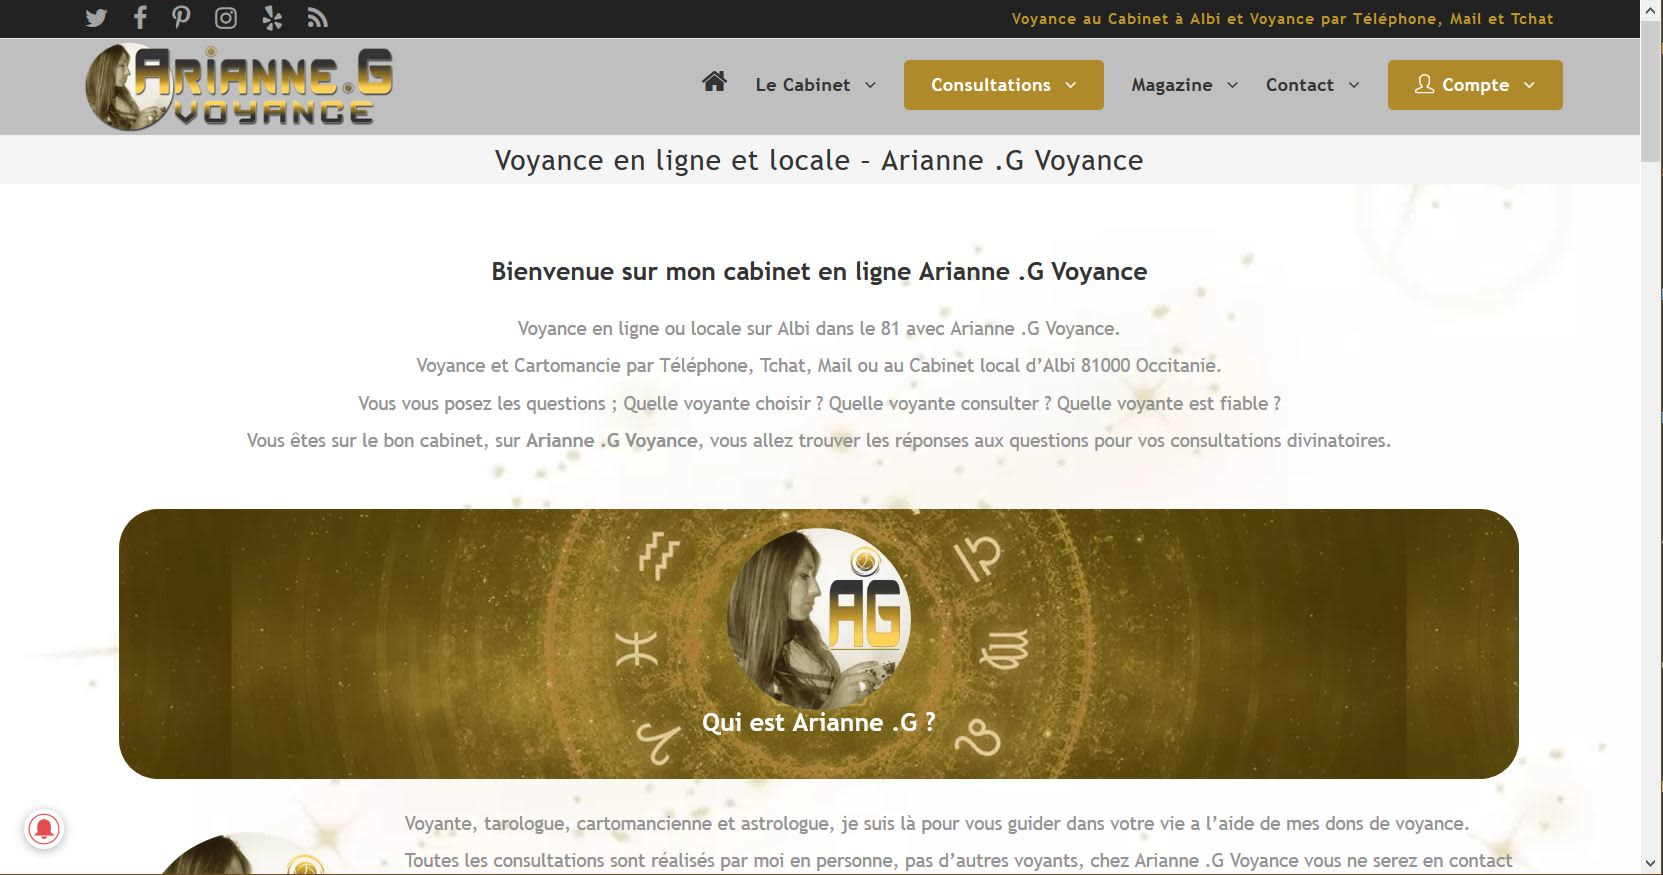 21a112f037e259 Arianne .G Voyance | Crunchbase